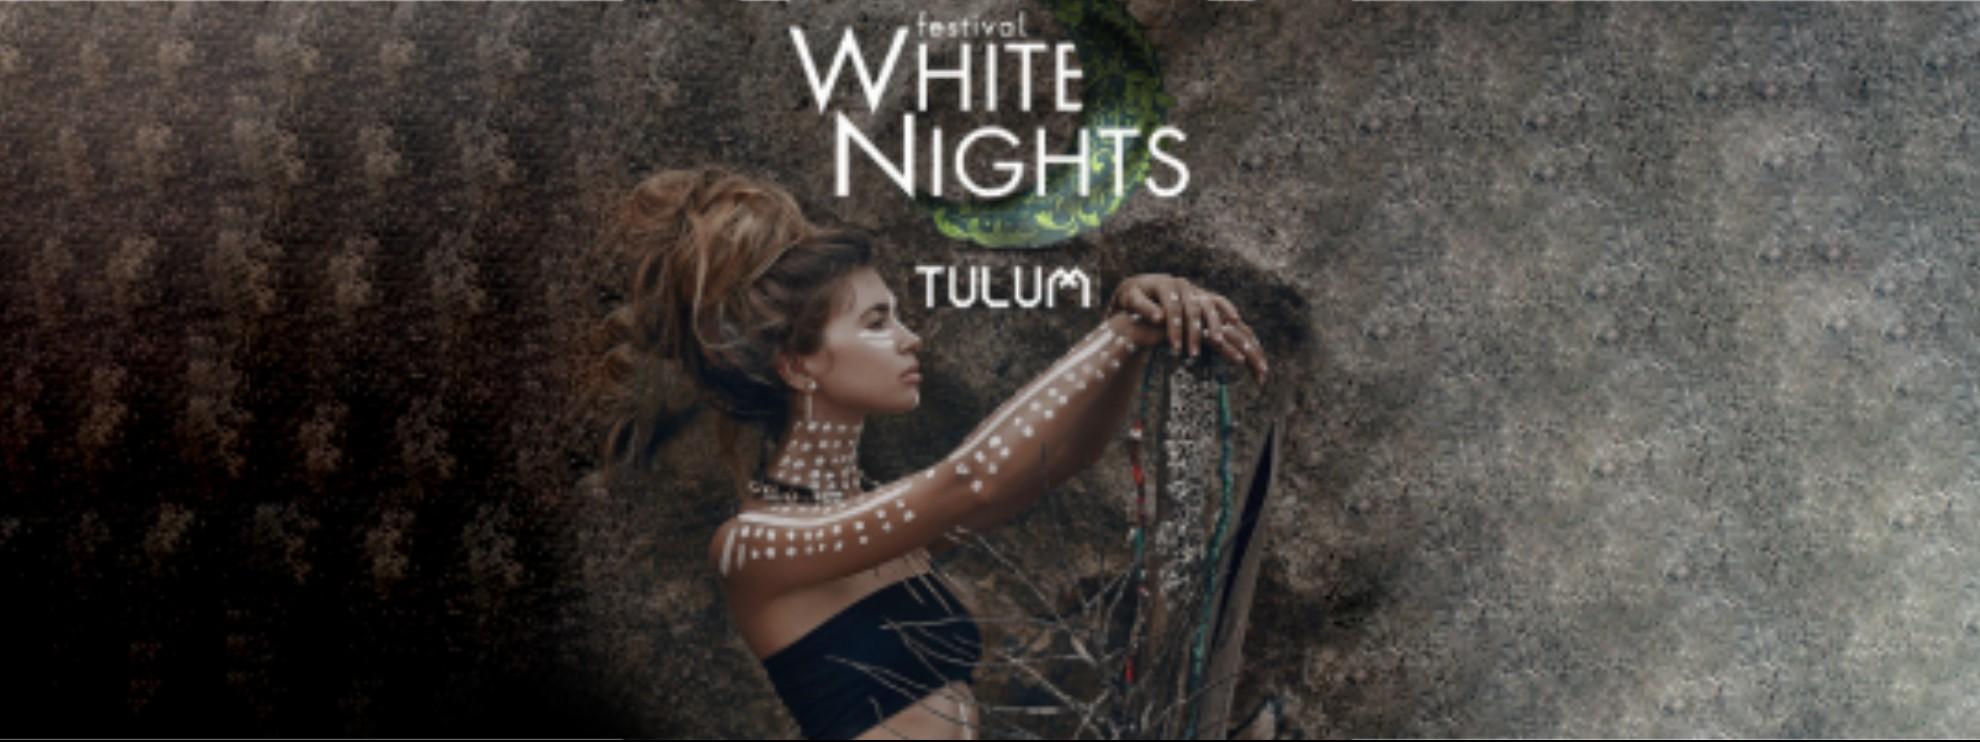 подія WHITE NIGHTS KYIV FESTIVAL «TULUM» (Білі ночі)